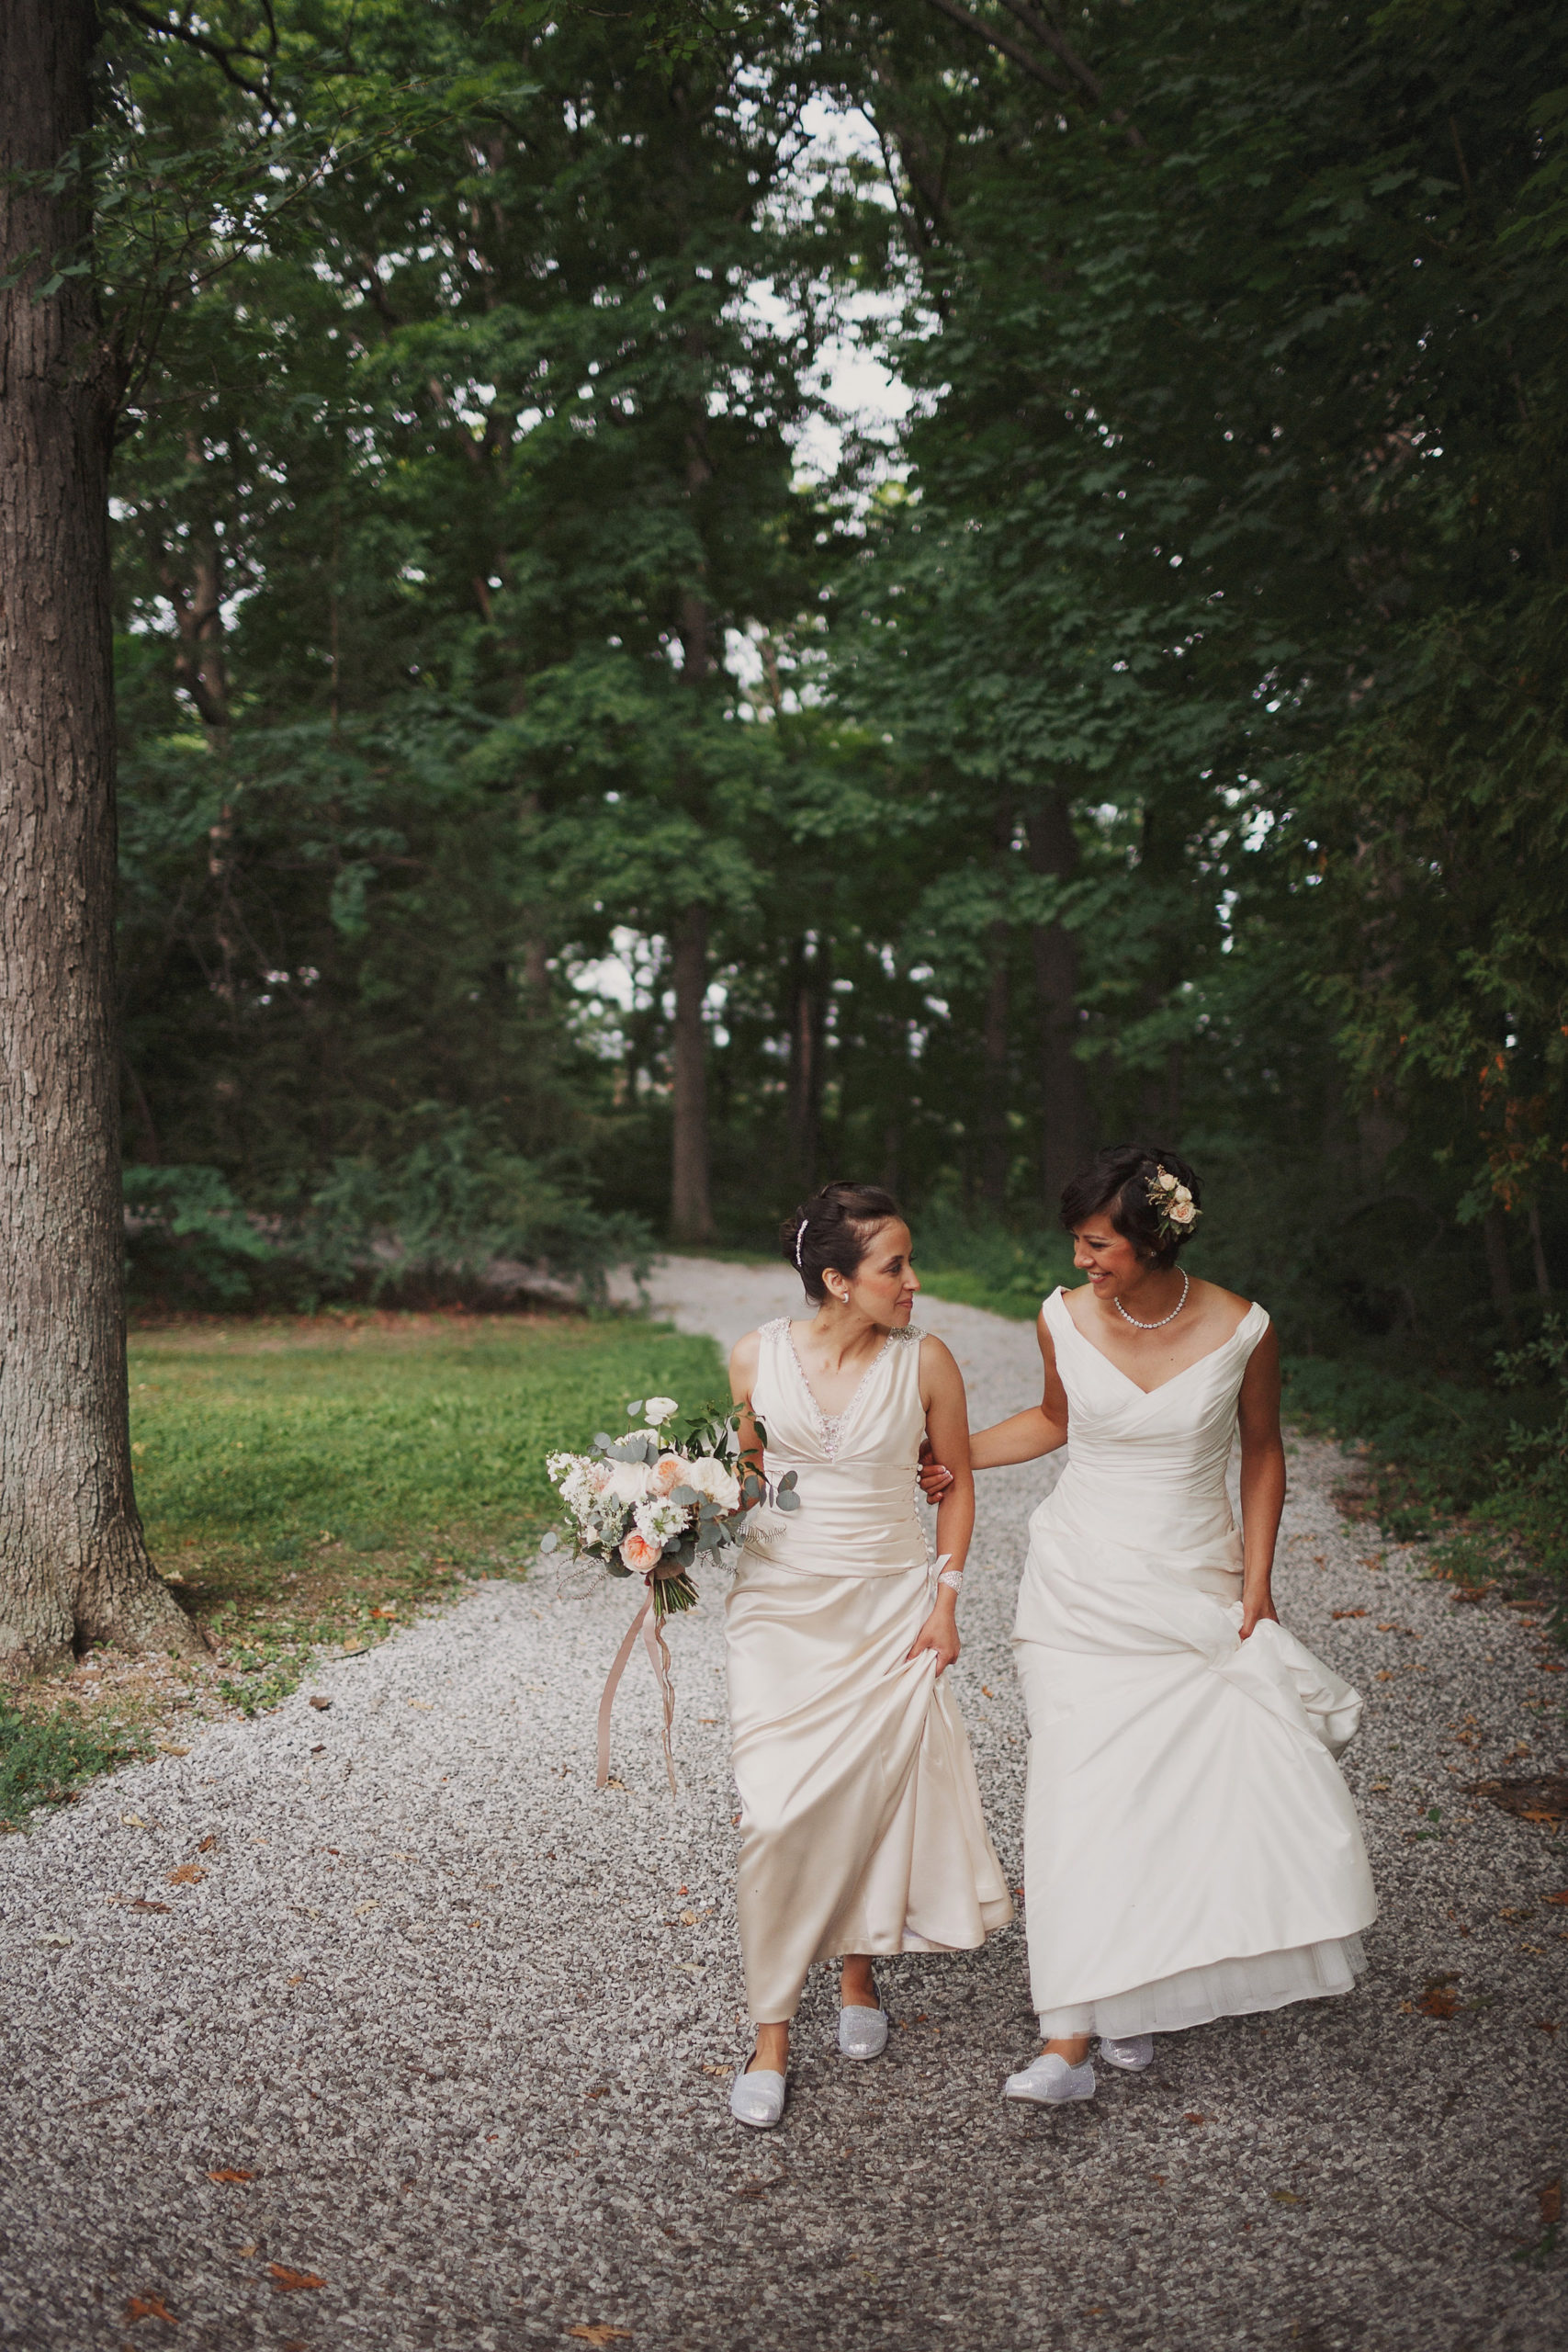 romantic wedding photography niagara same sex brides lgbtq forest